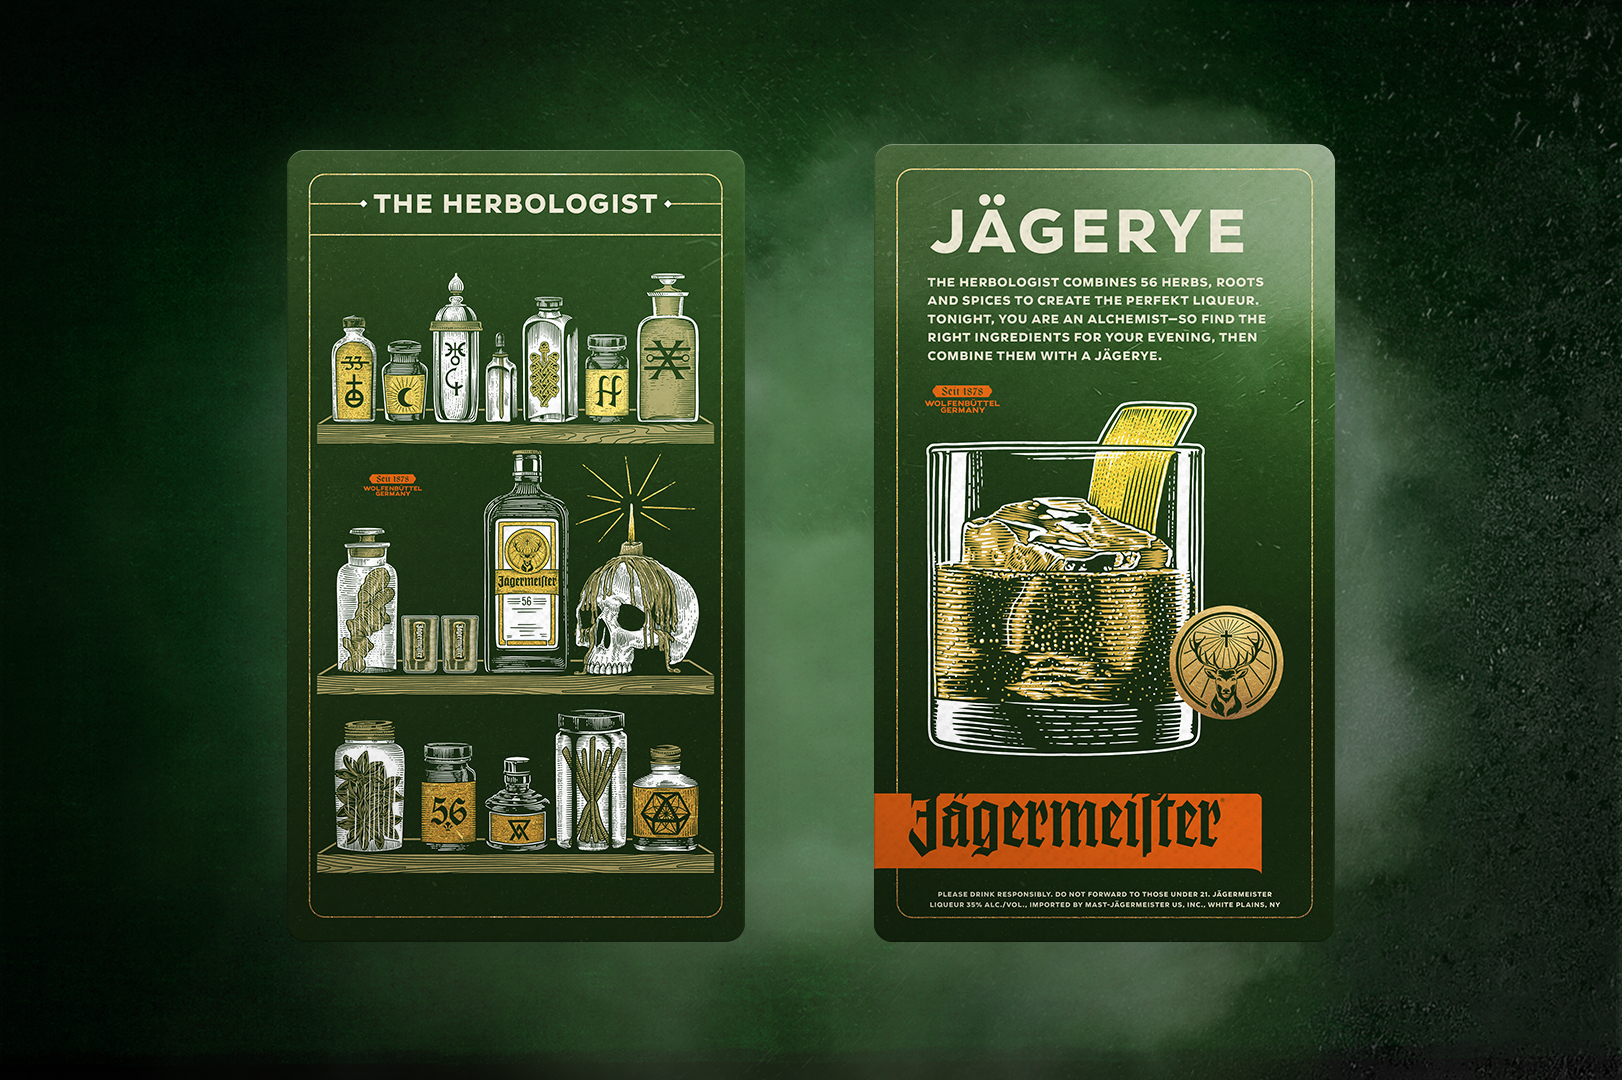 Jagermeister_Tarot_Herbologist.jpg